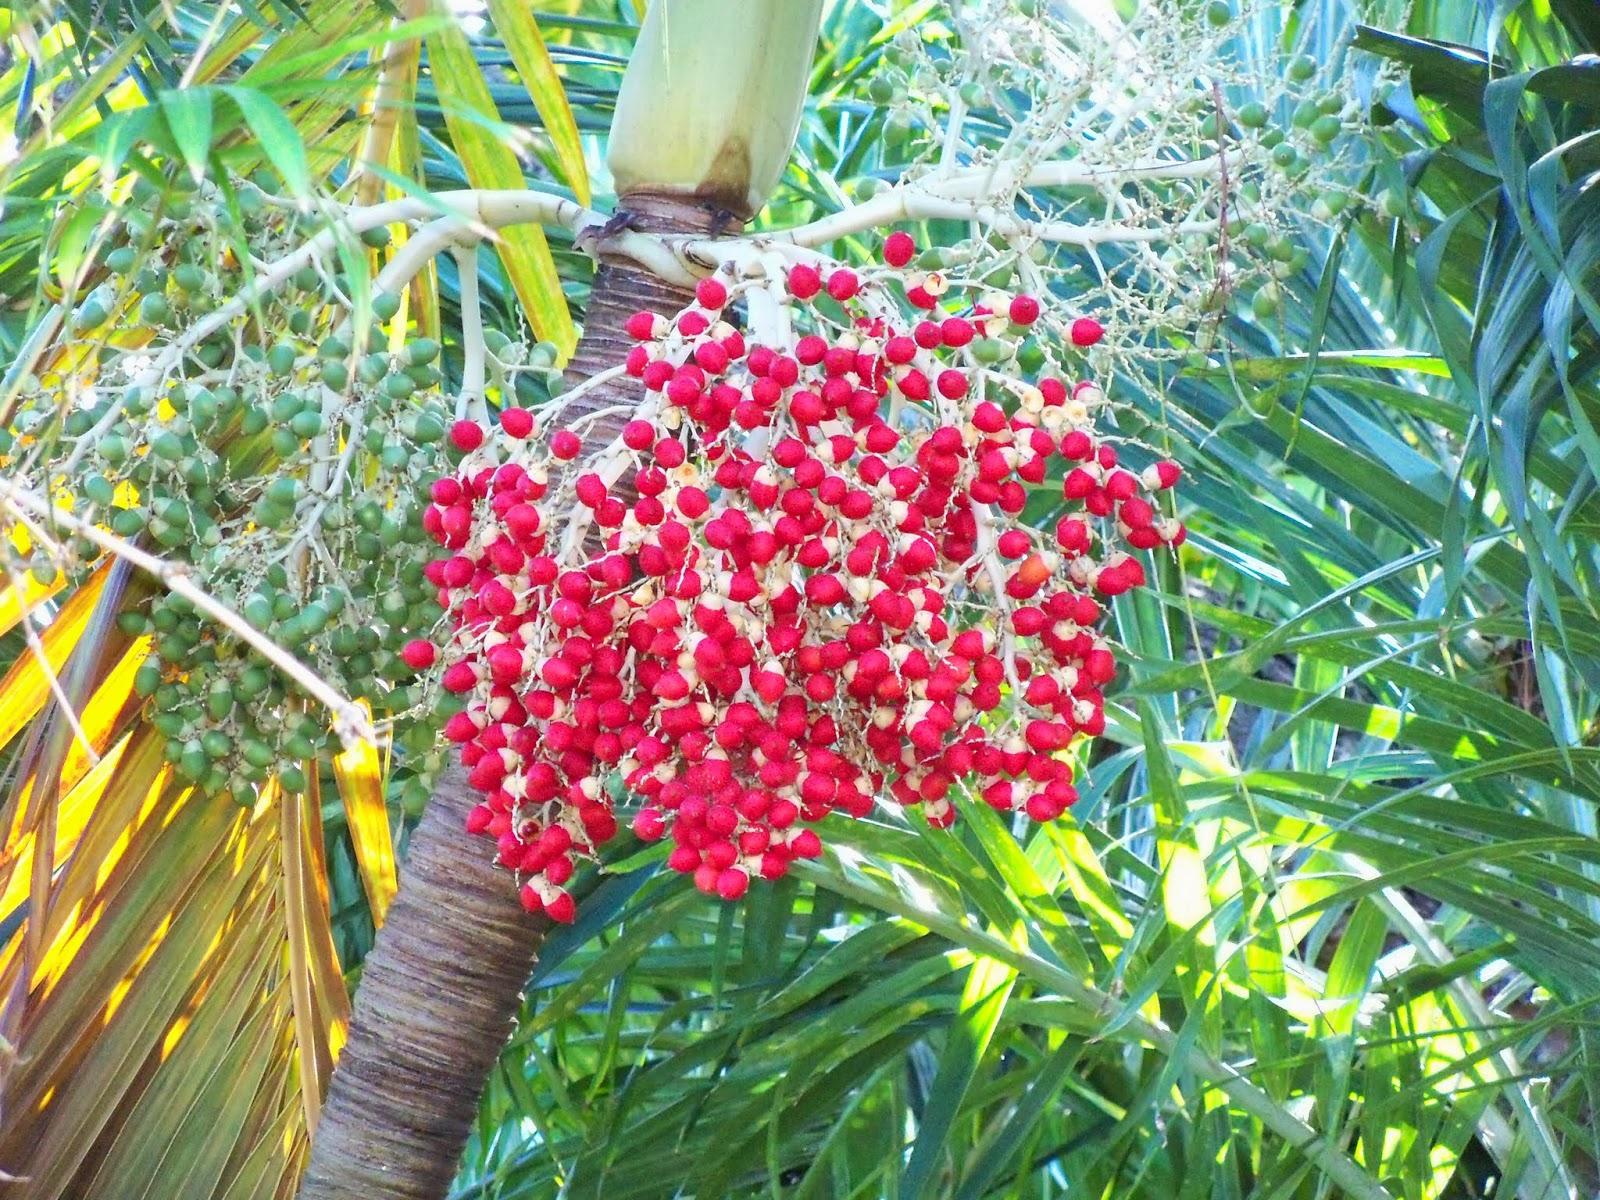 Key West Vacation - 116_5426.JPG